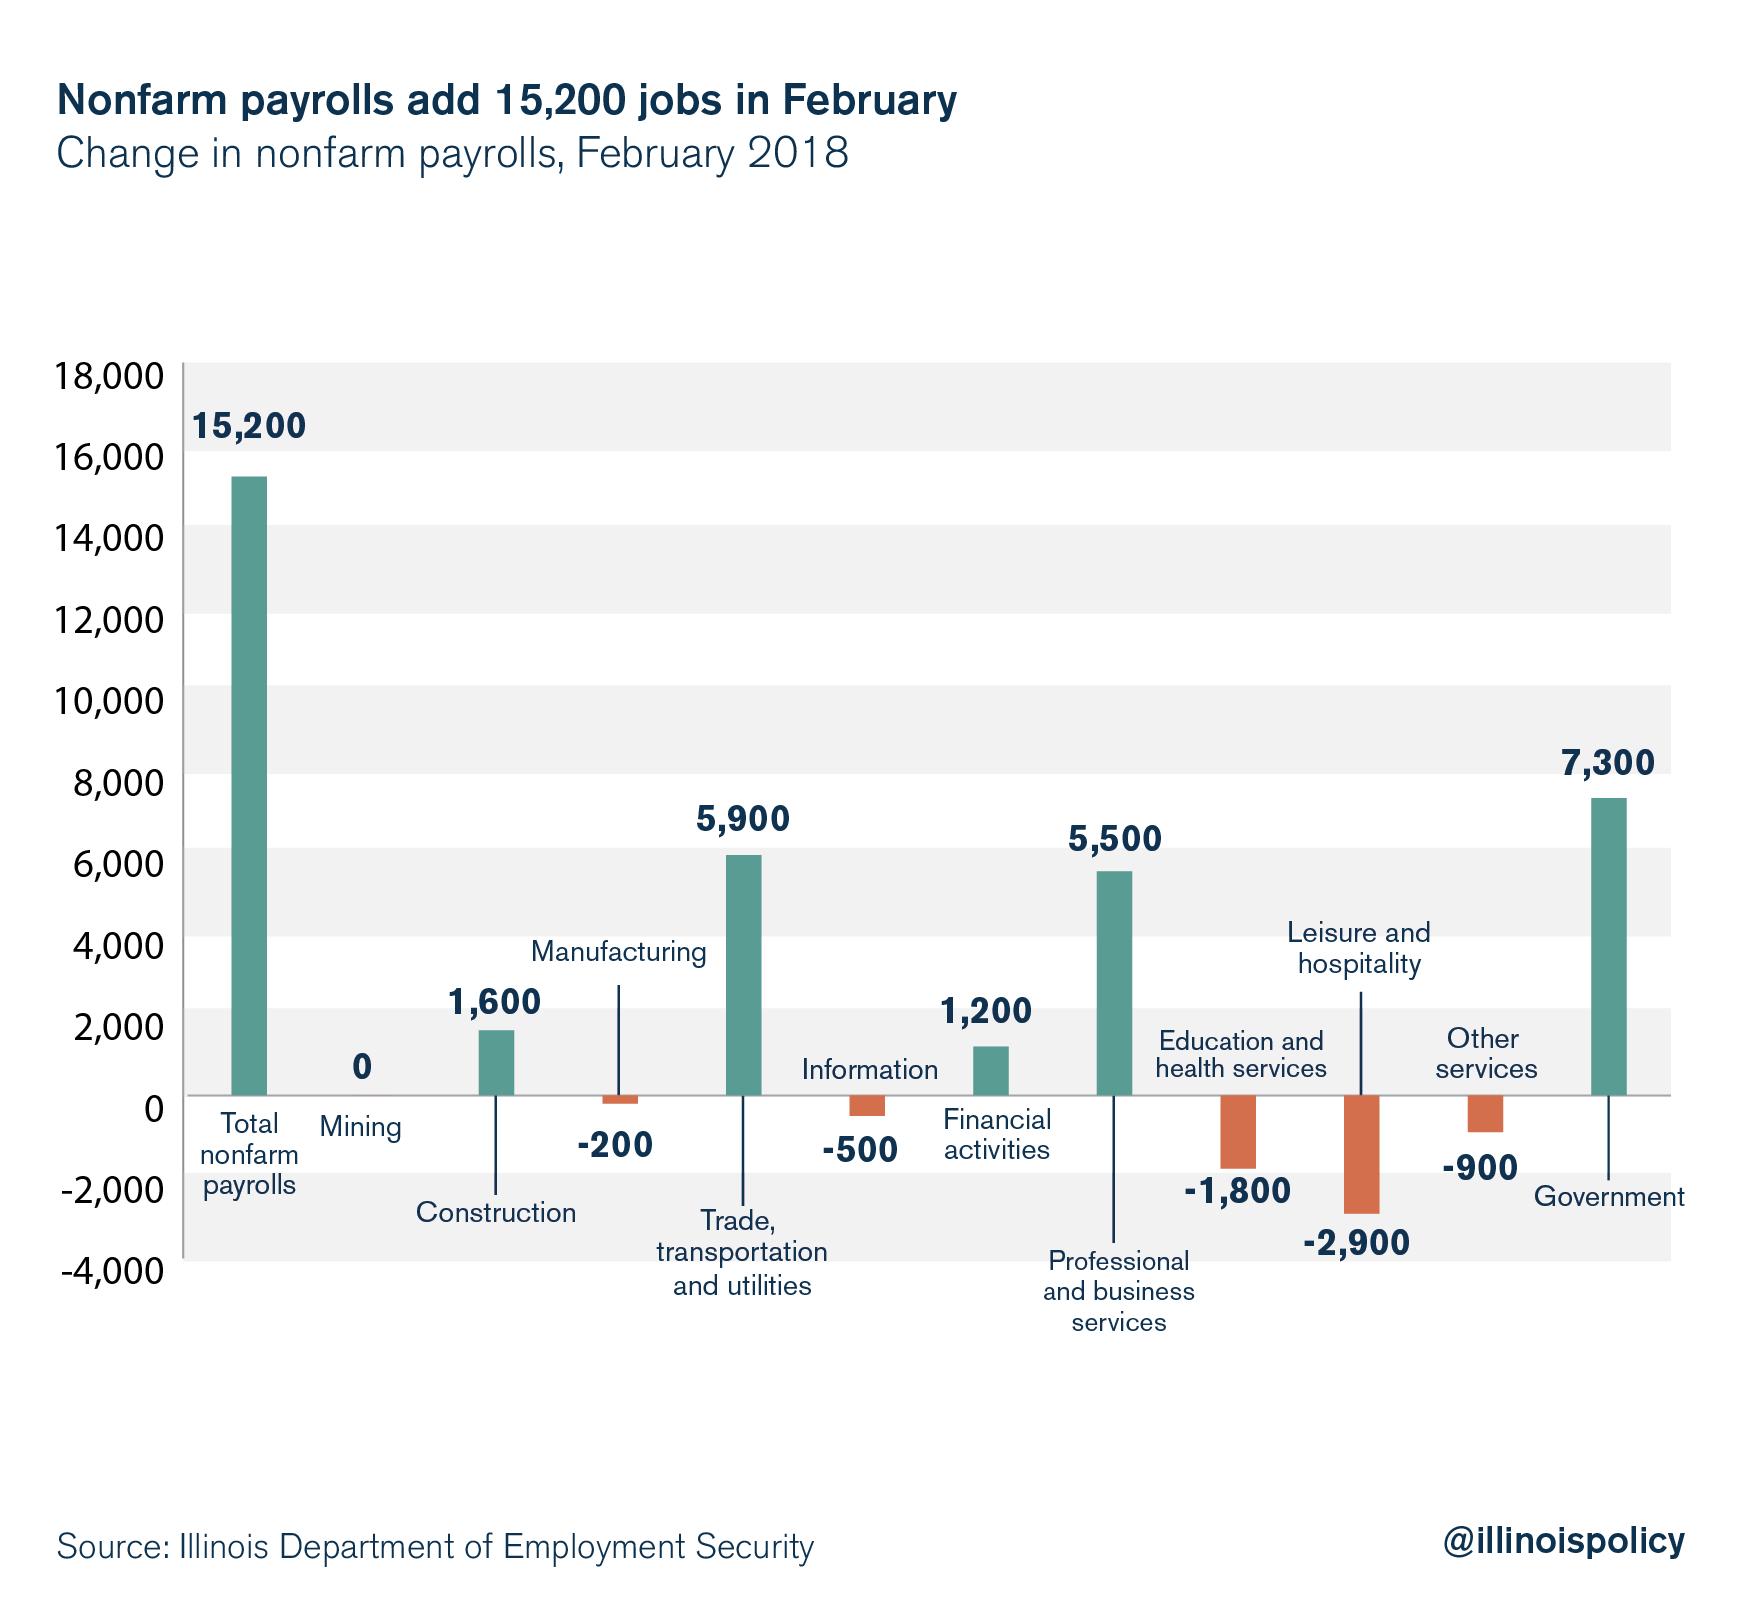 Nonfarm payrolls add 15,200 jobs in February